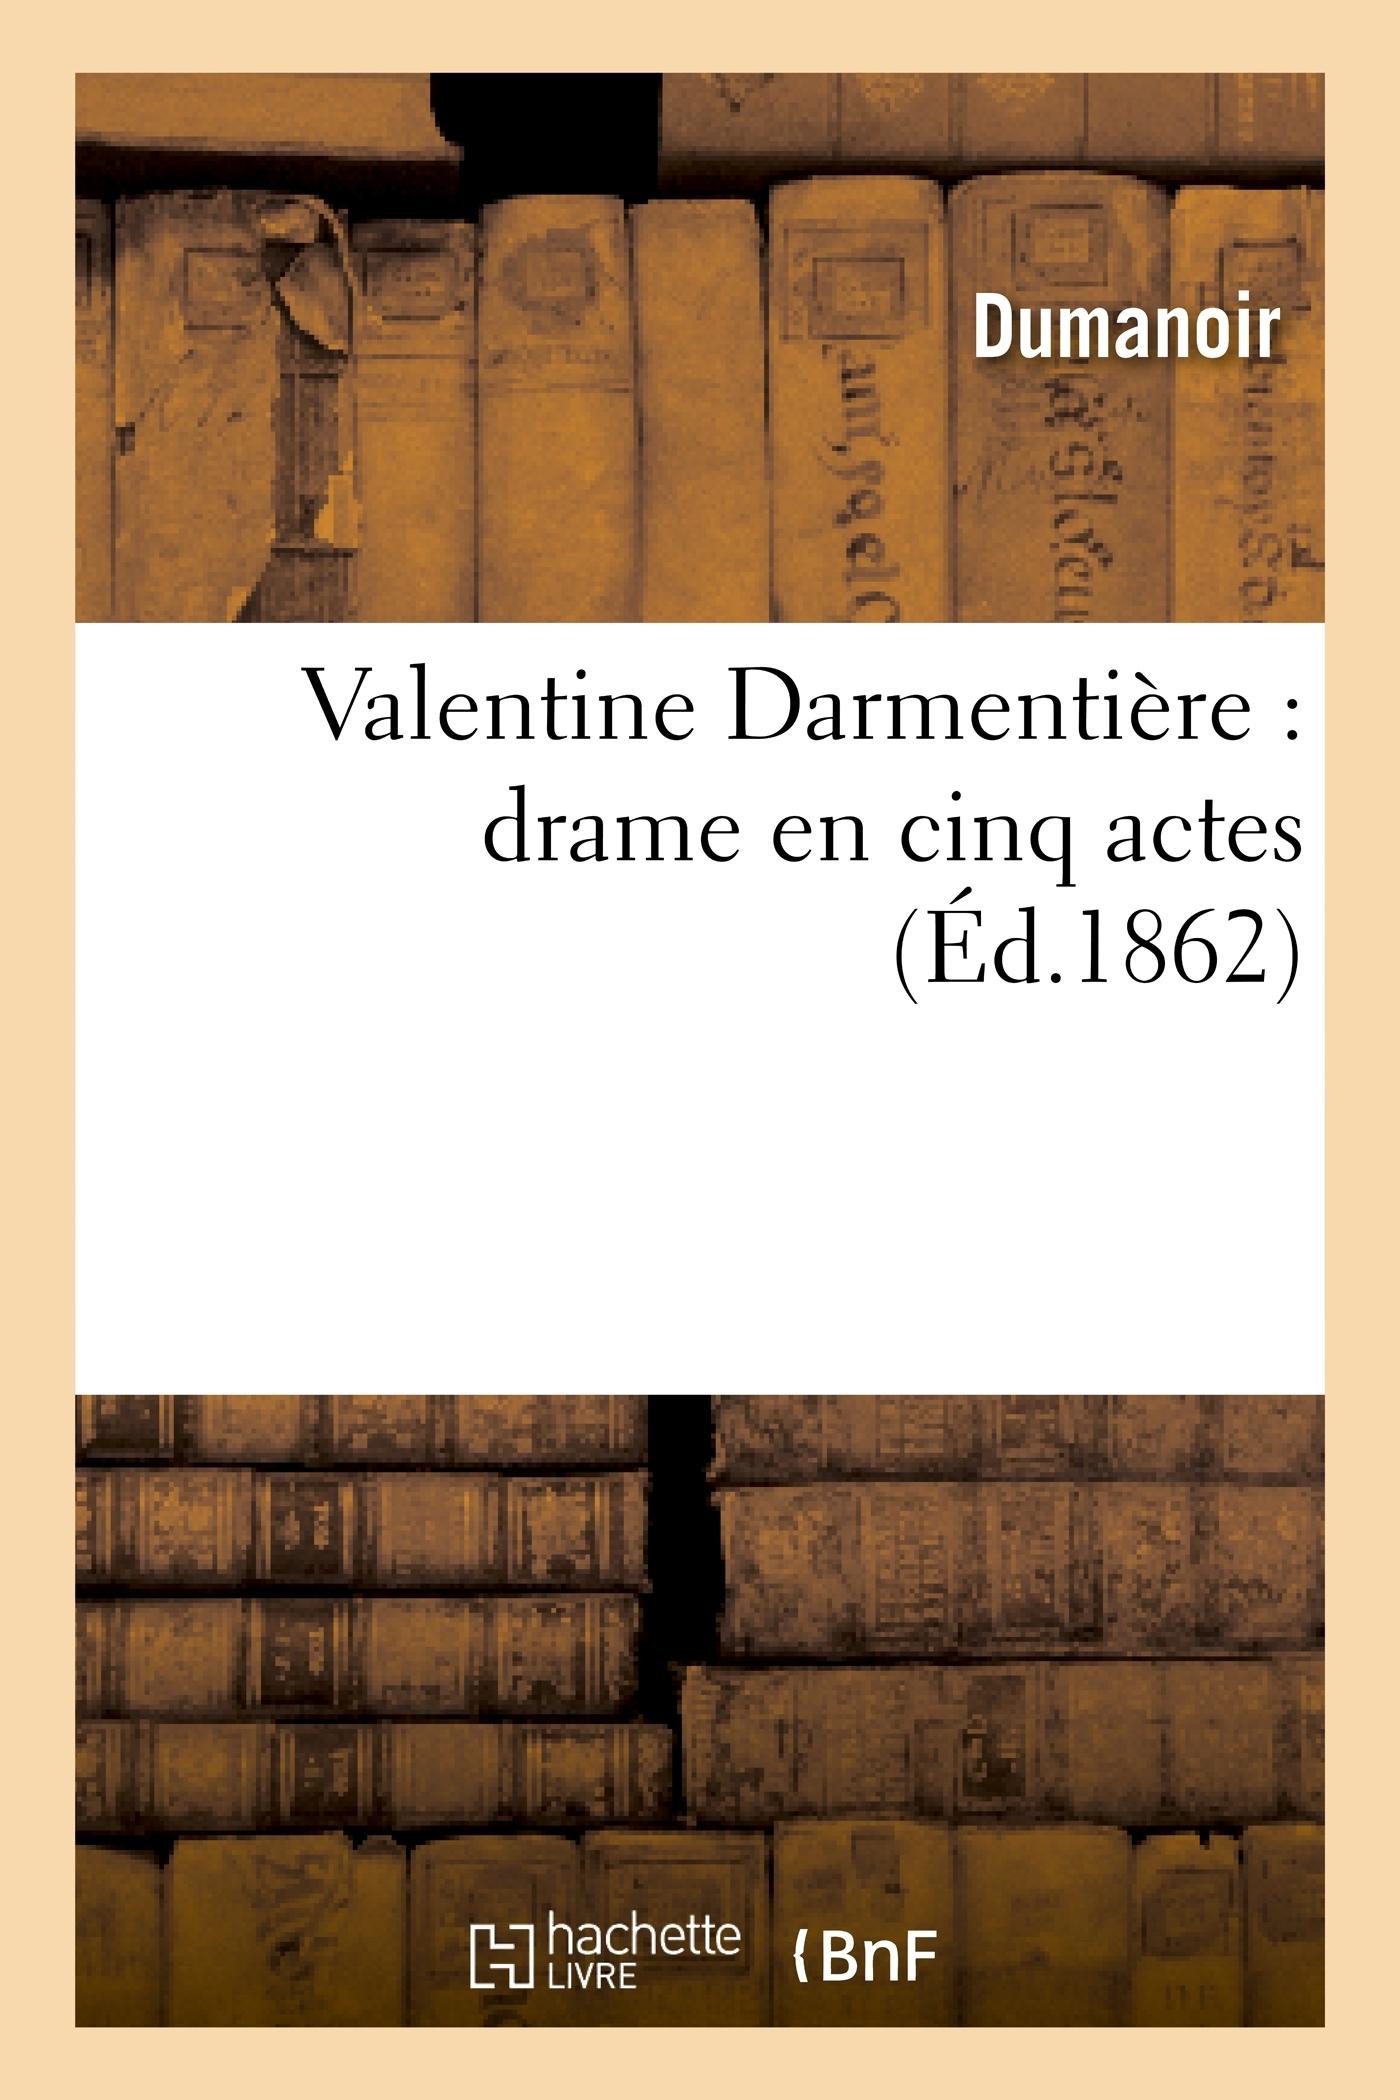 VALENTINE DARMENTIERE : DRAME EN CINQ ACTES